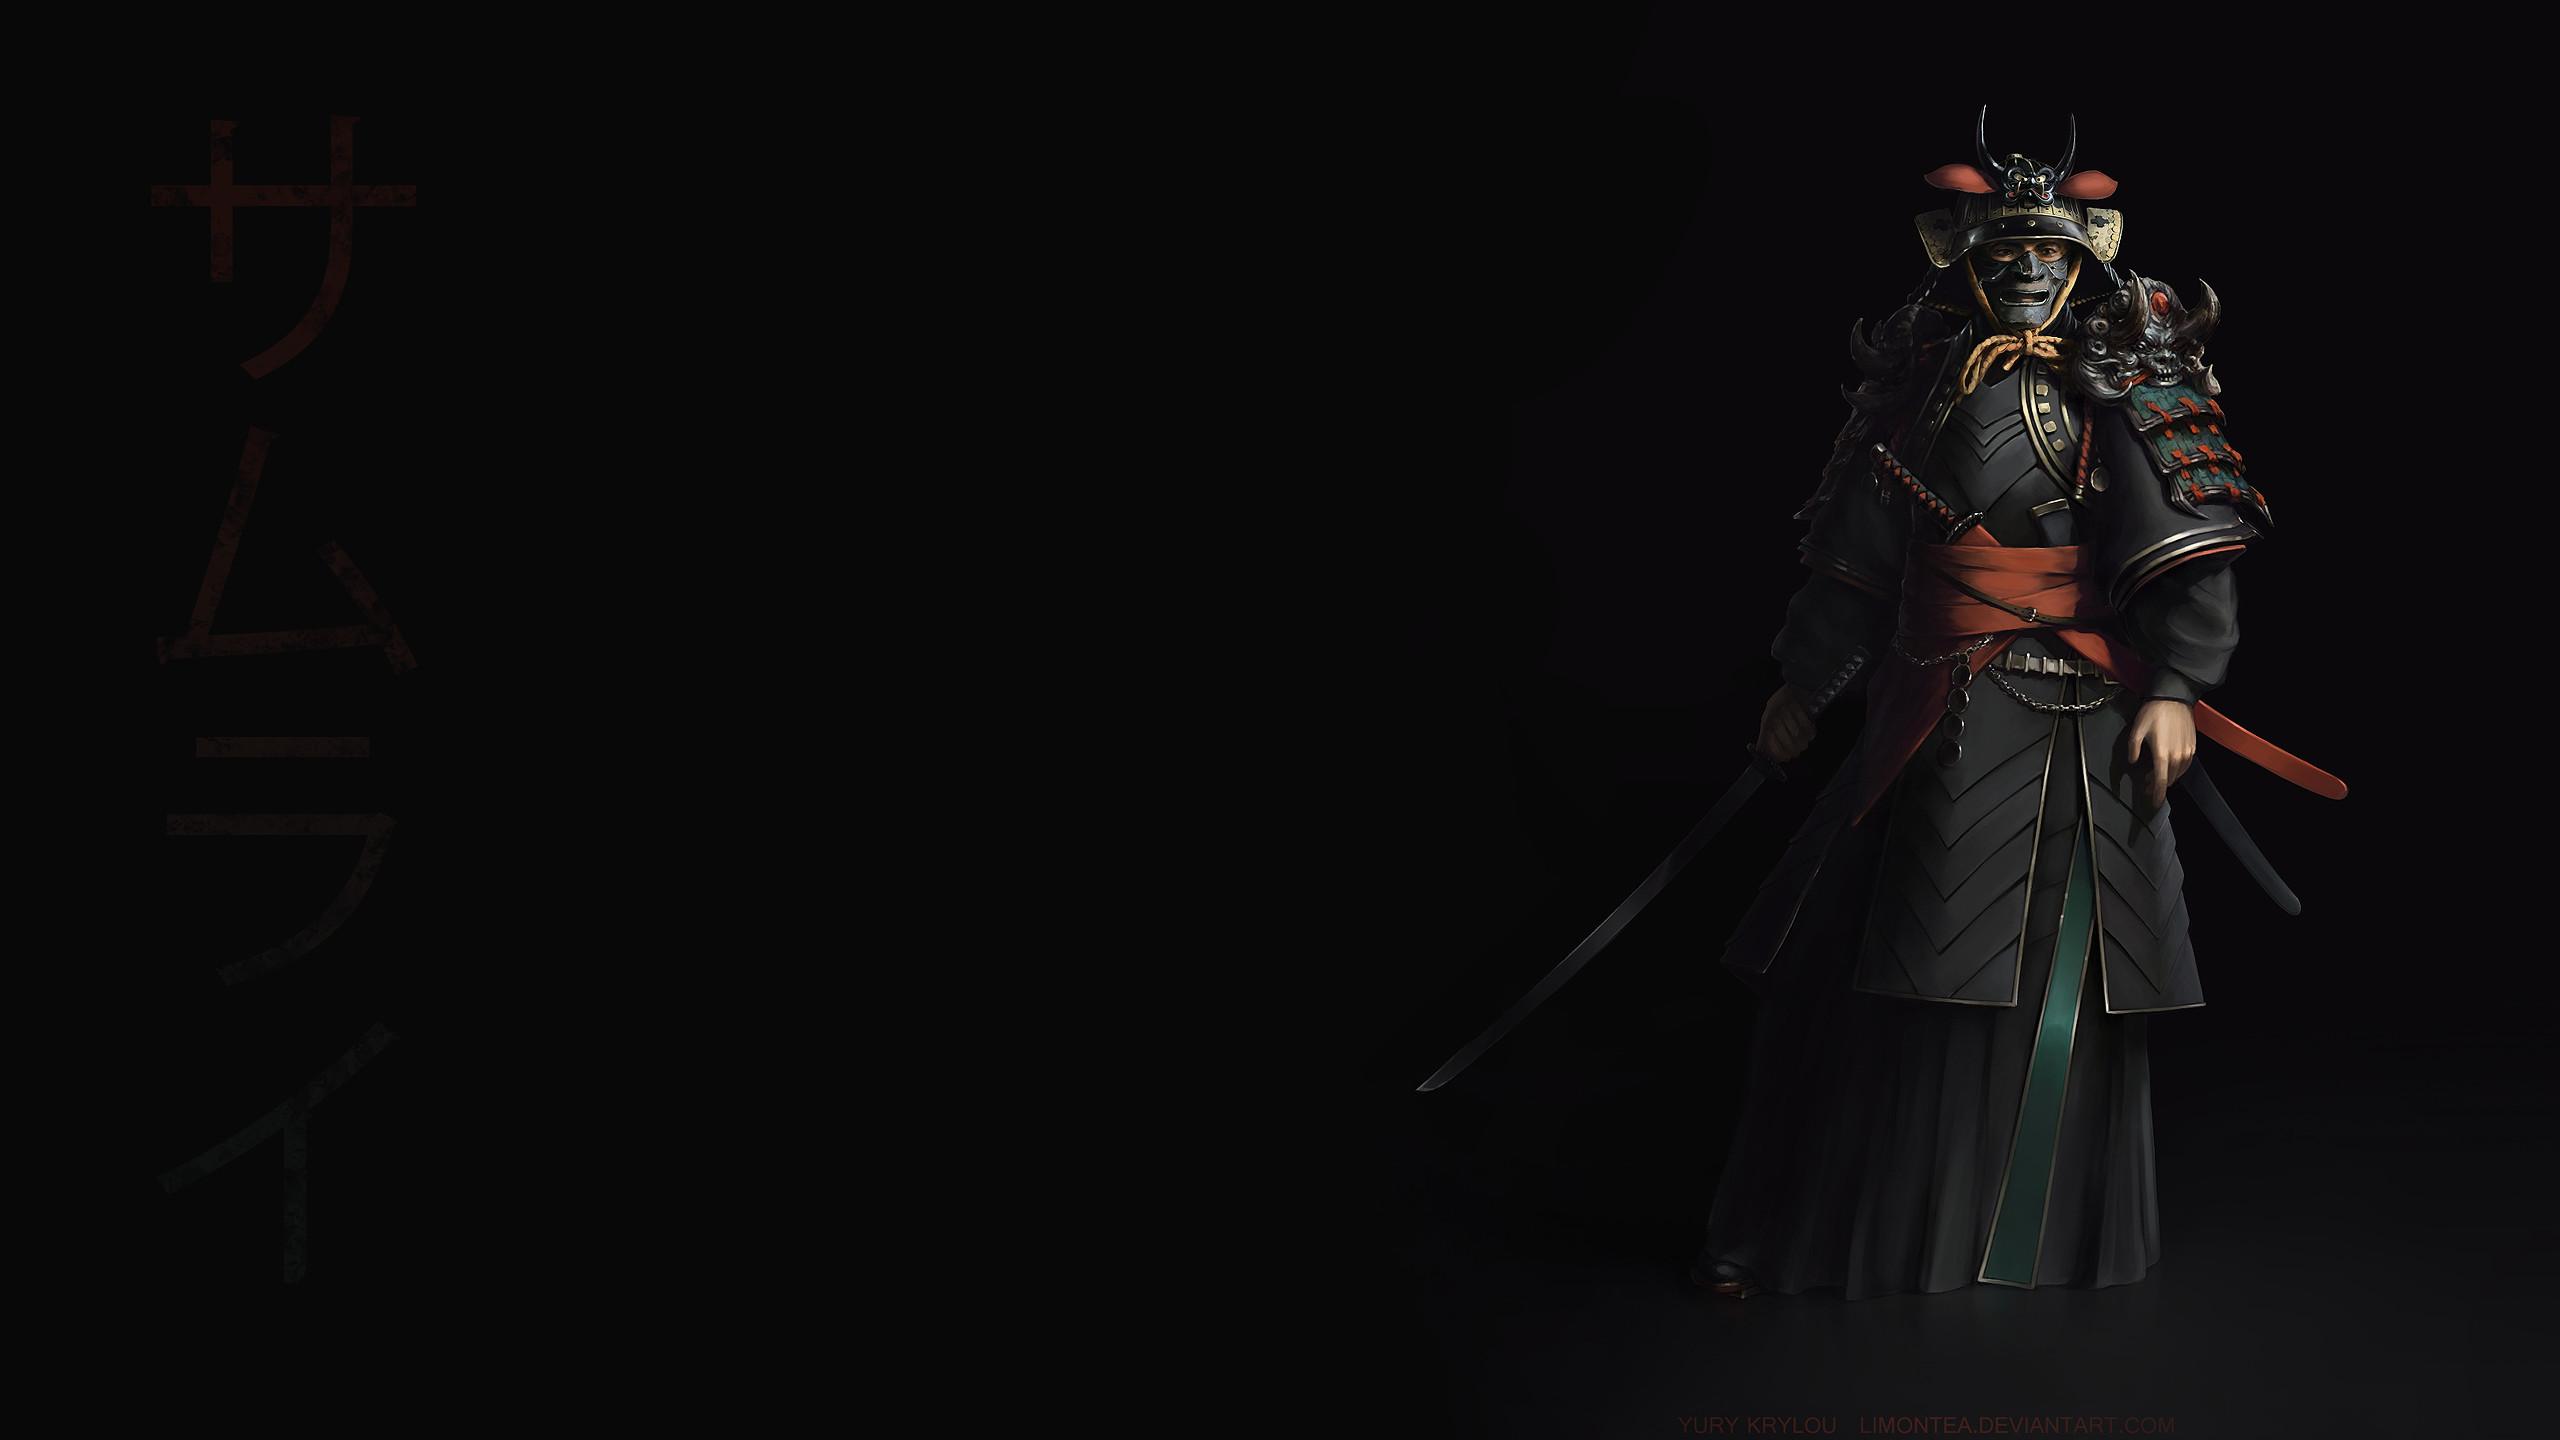 Bushido Samurai Wallpaper 62 Pictures